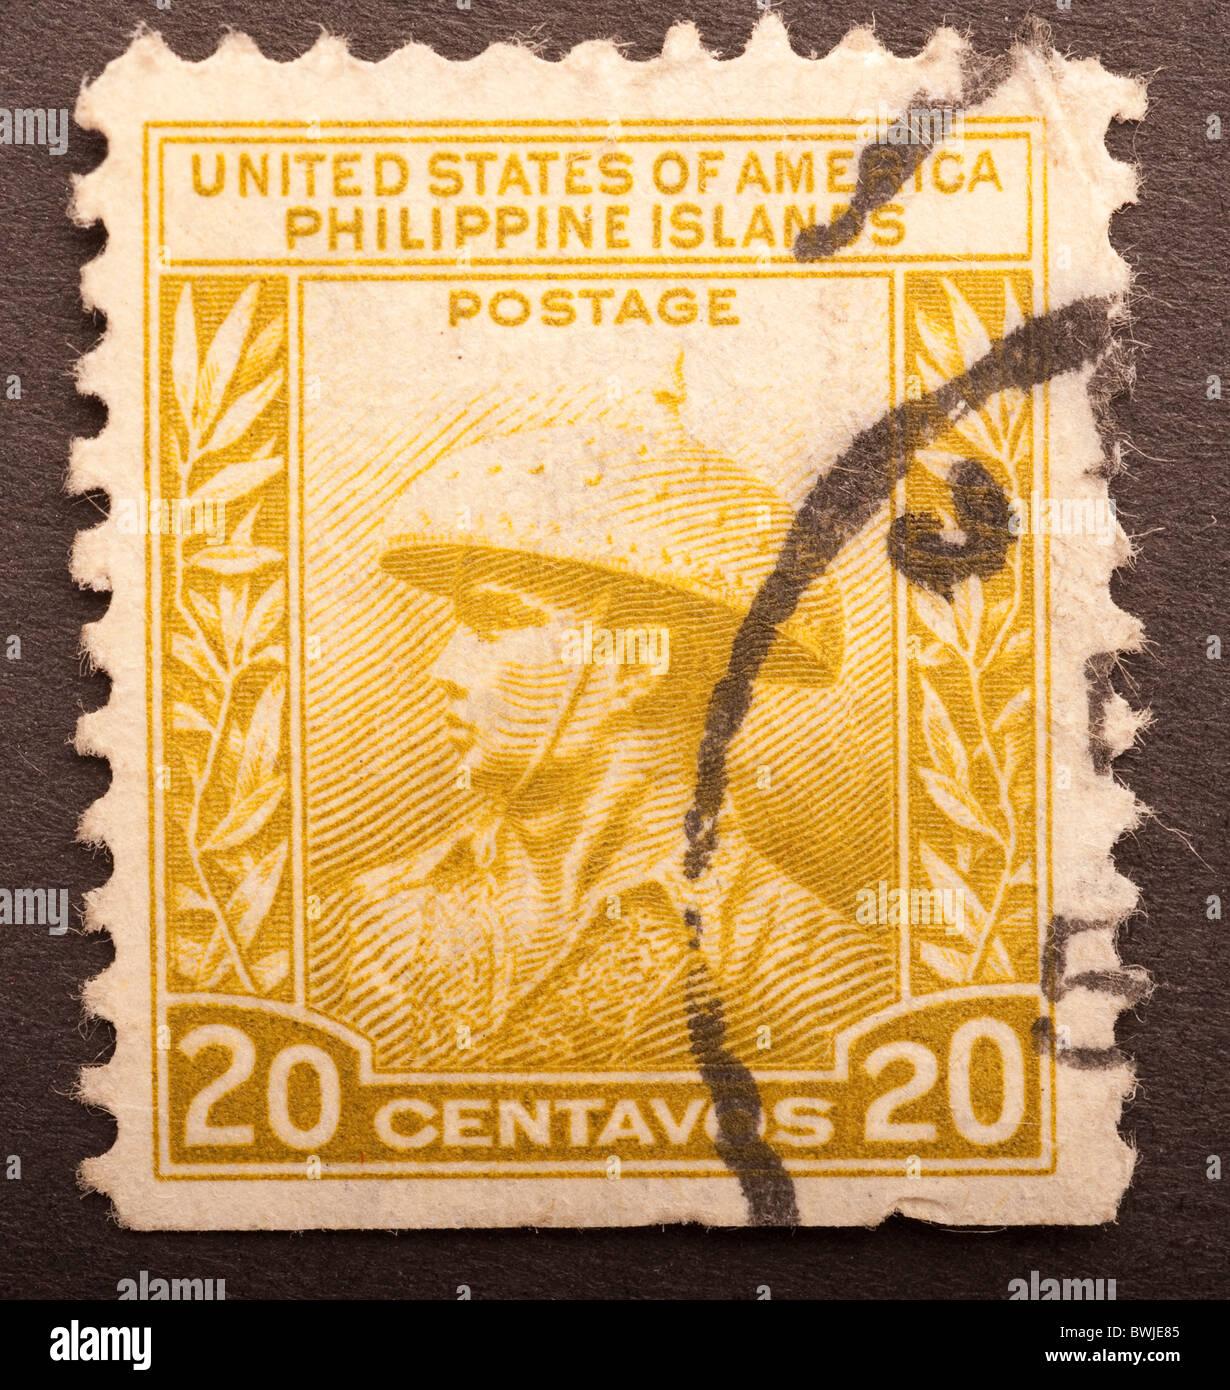 United States Of America Philippine Islands Postage Stamp 20 centavos - Stock Image